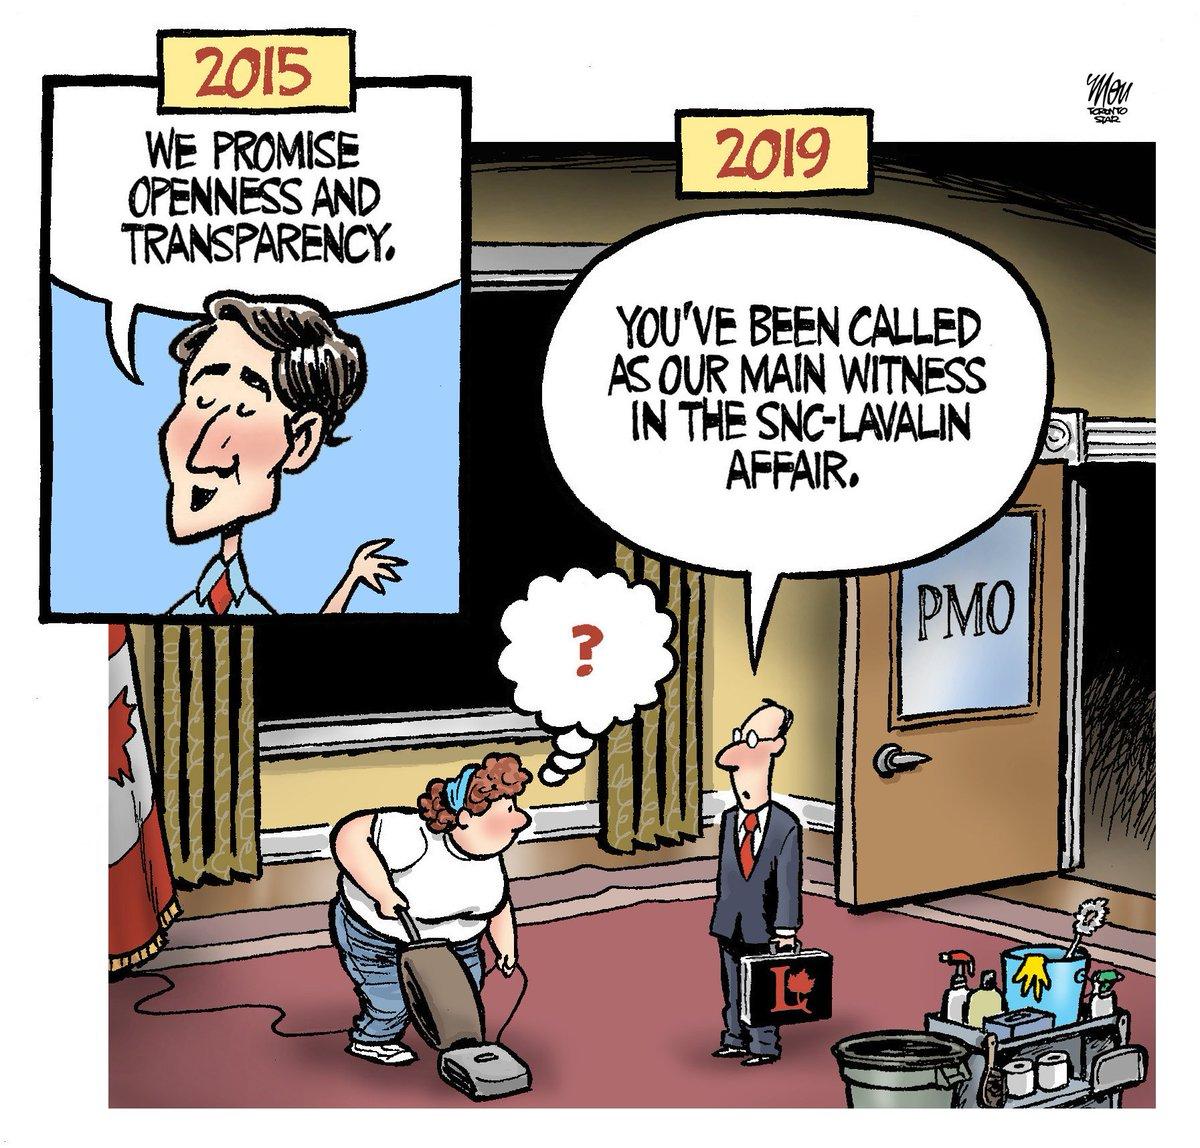 Here's todY'S #SNCLavalin cartoon in @TorontoStar